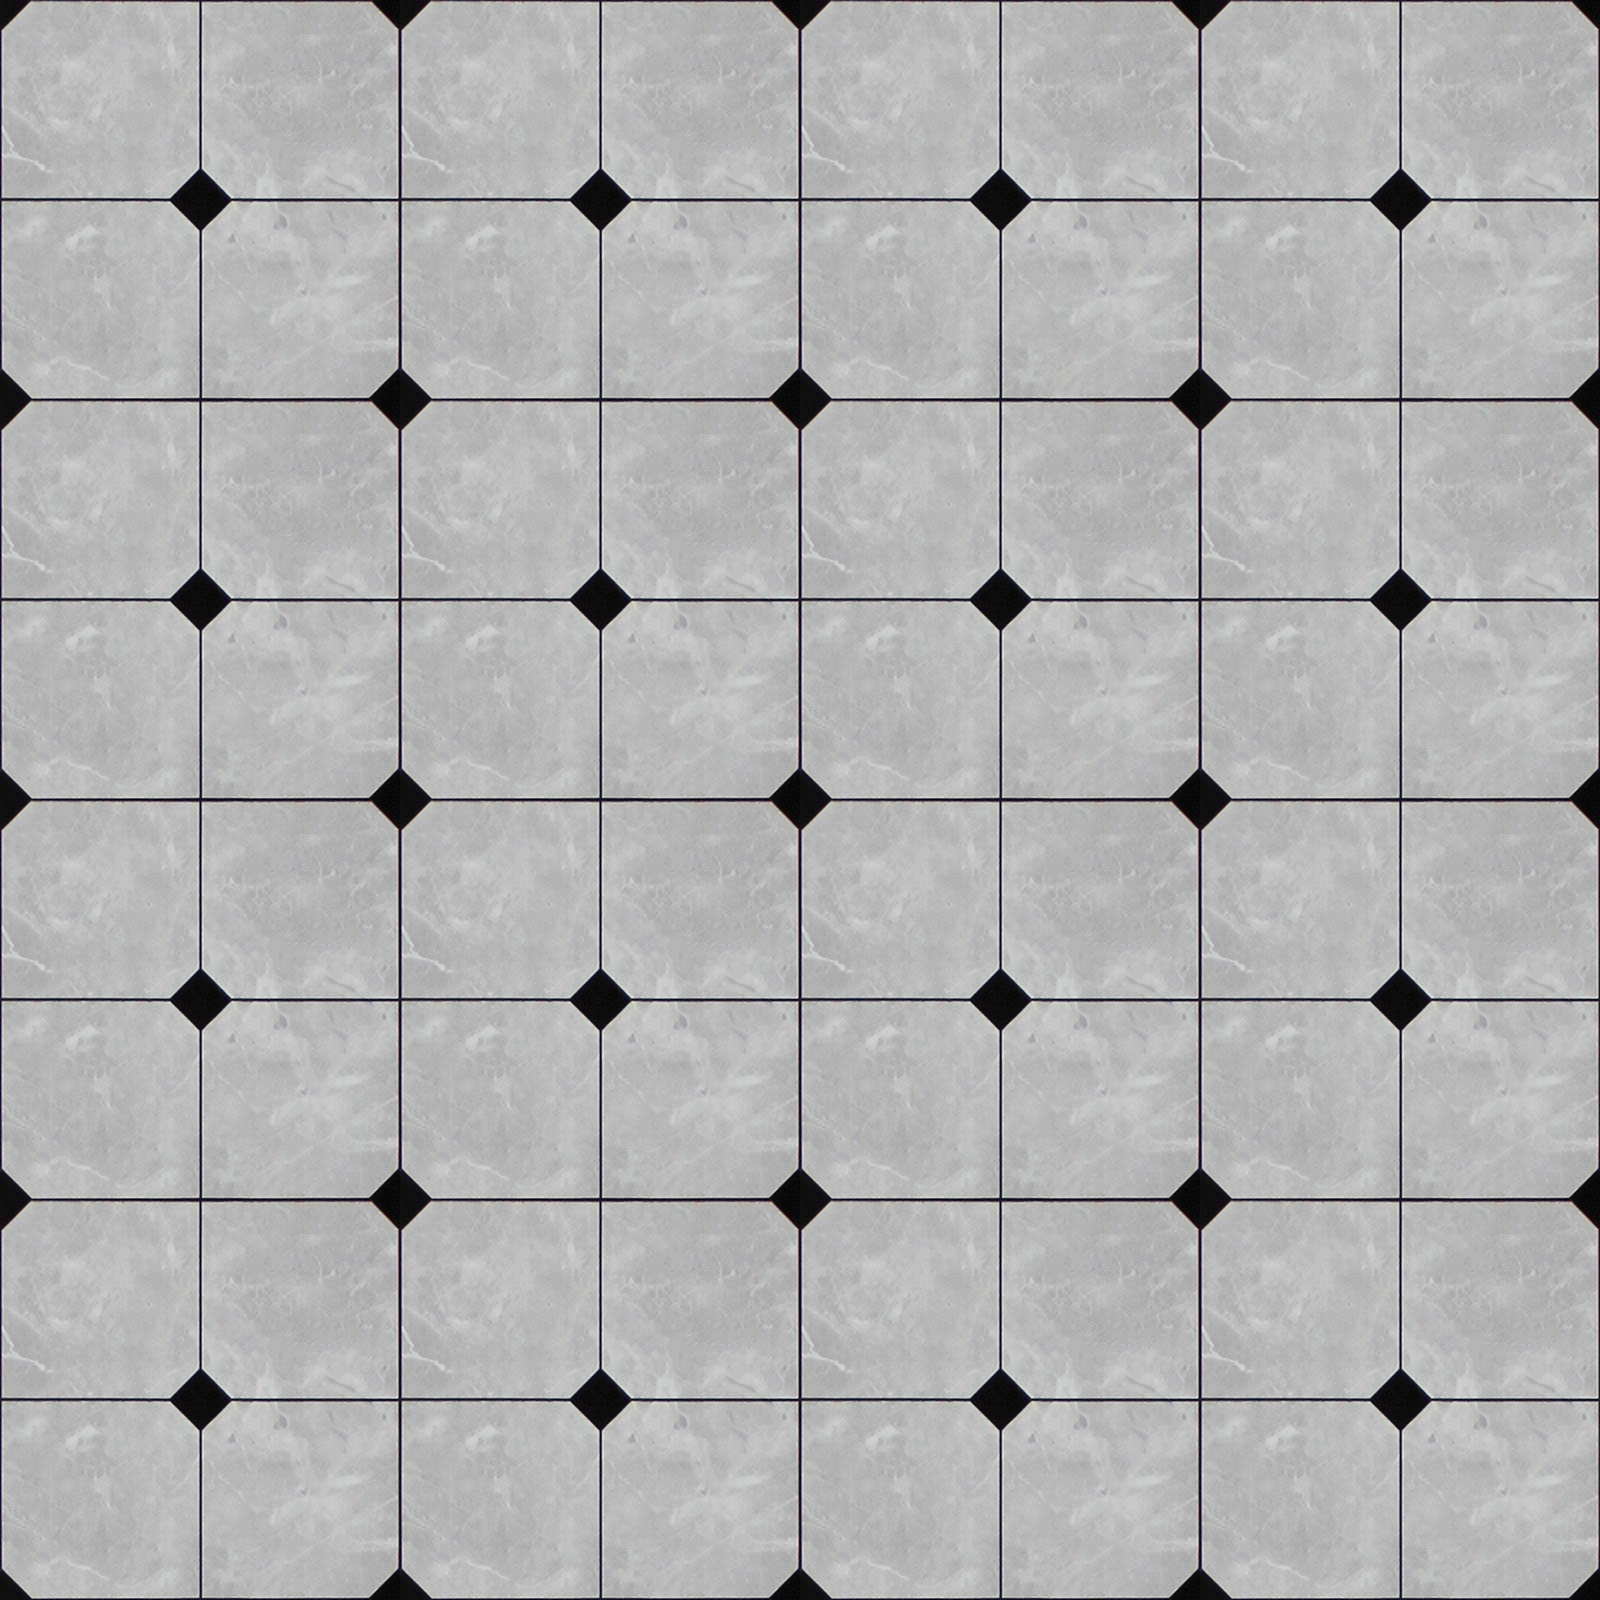 Brick Vector Picture Brick Tile Backsplash Designmore